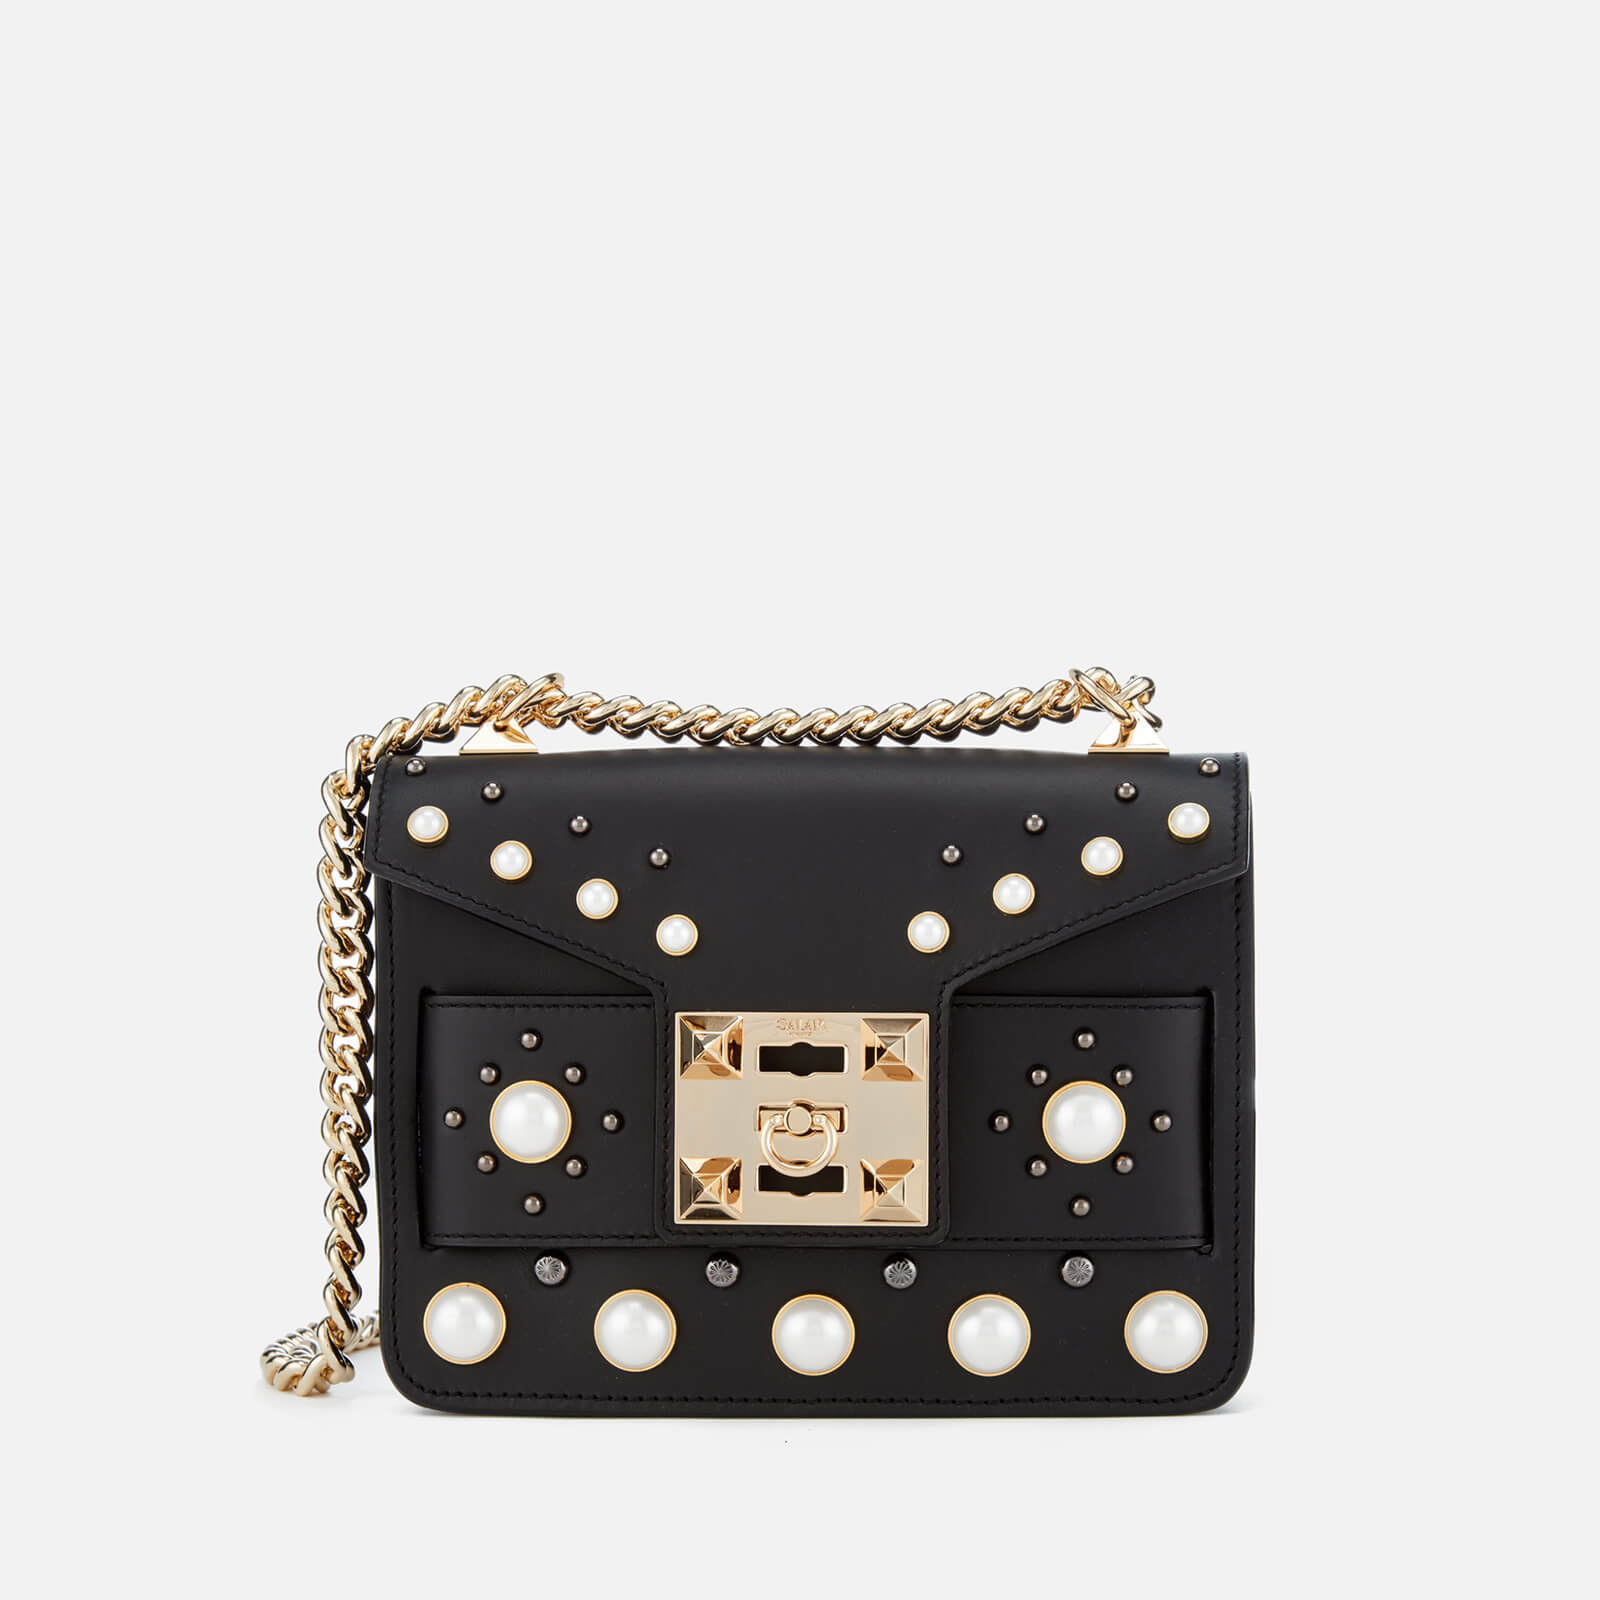 SALAR Women s Mila Pearl Bag - Black - Free UK Delivery over £50